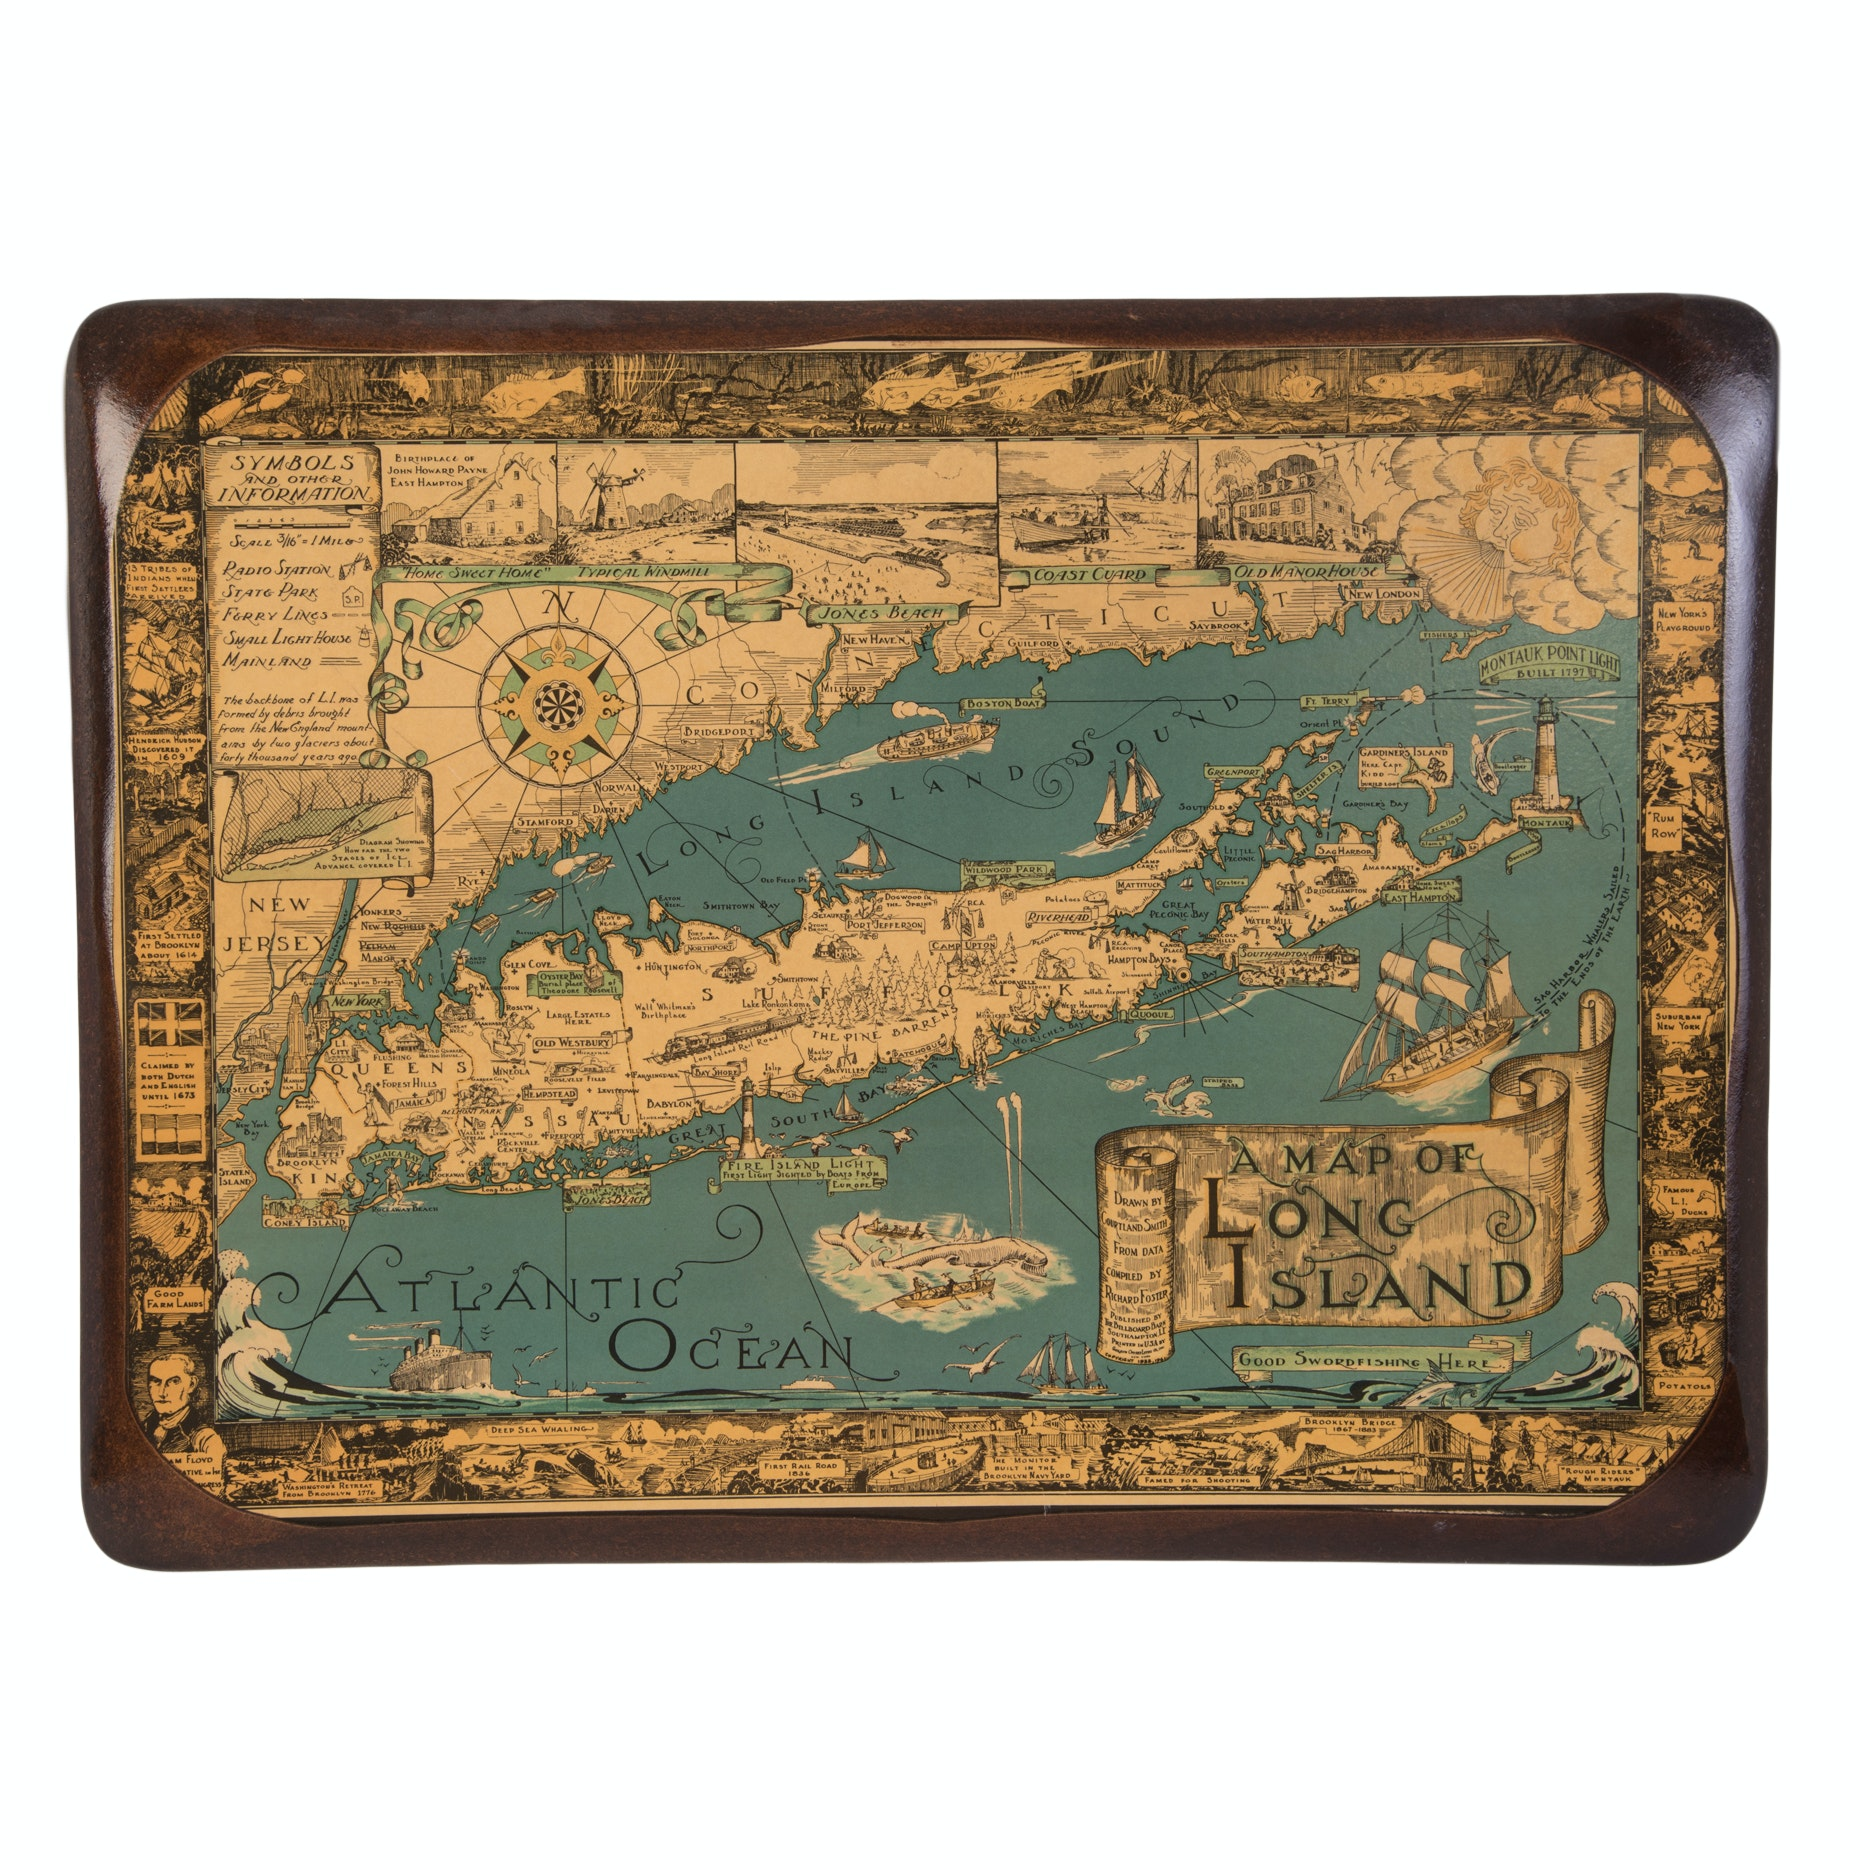 Map Of Long Island, New York Mixed Media Print